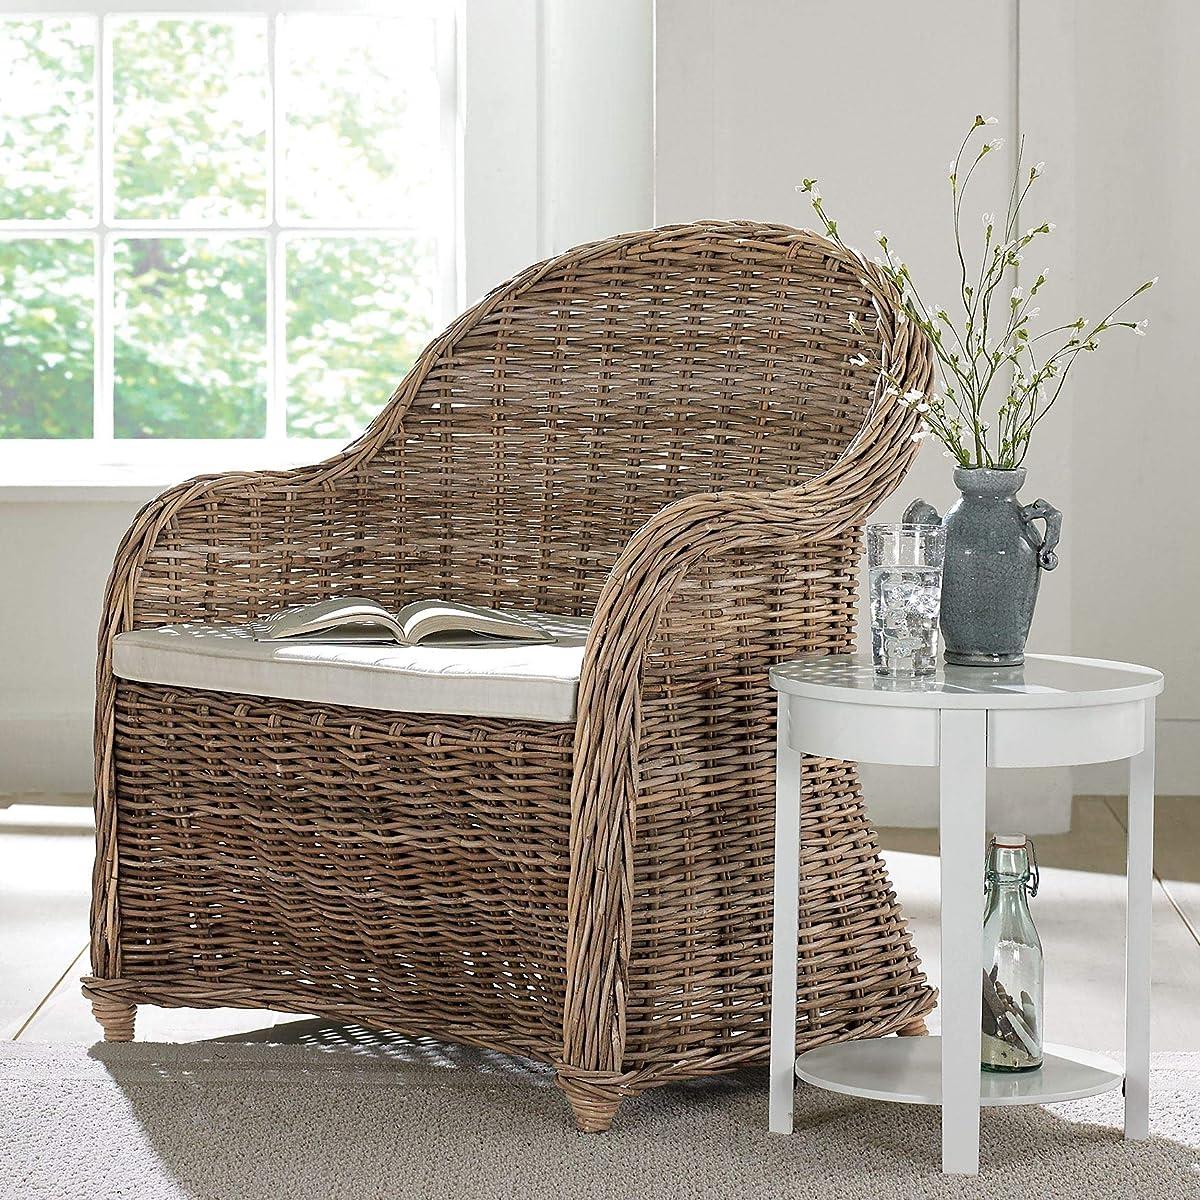 BrylaneHome Whitman Oversized Wicker Chair